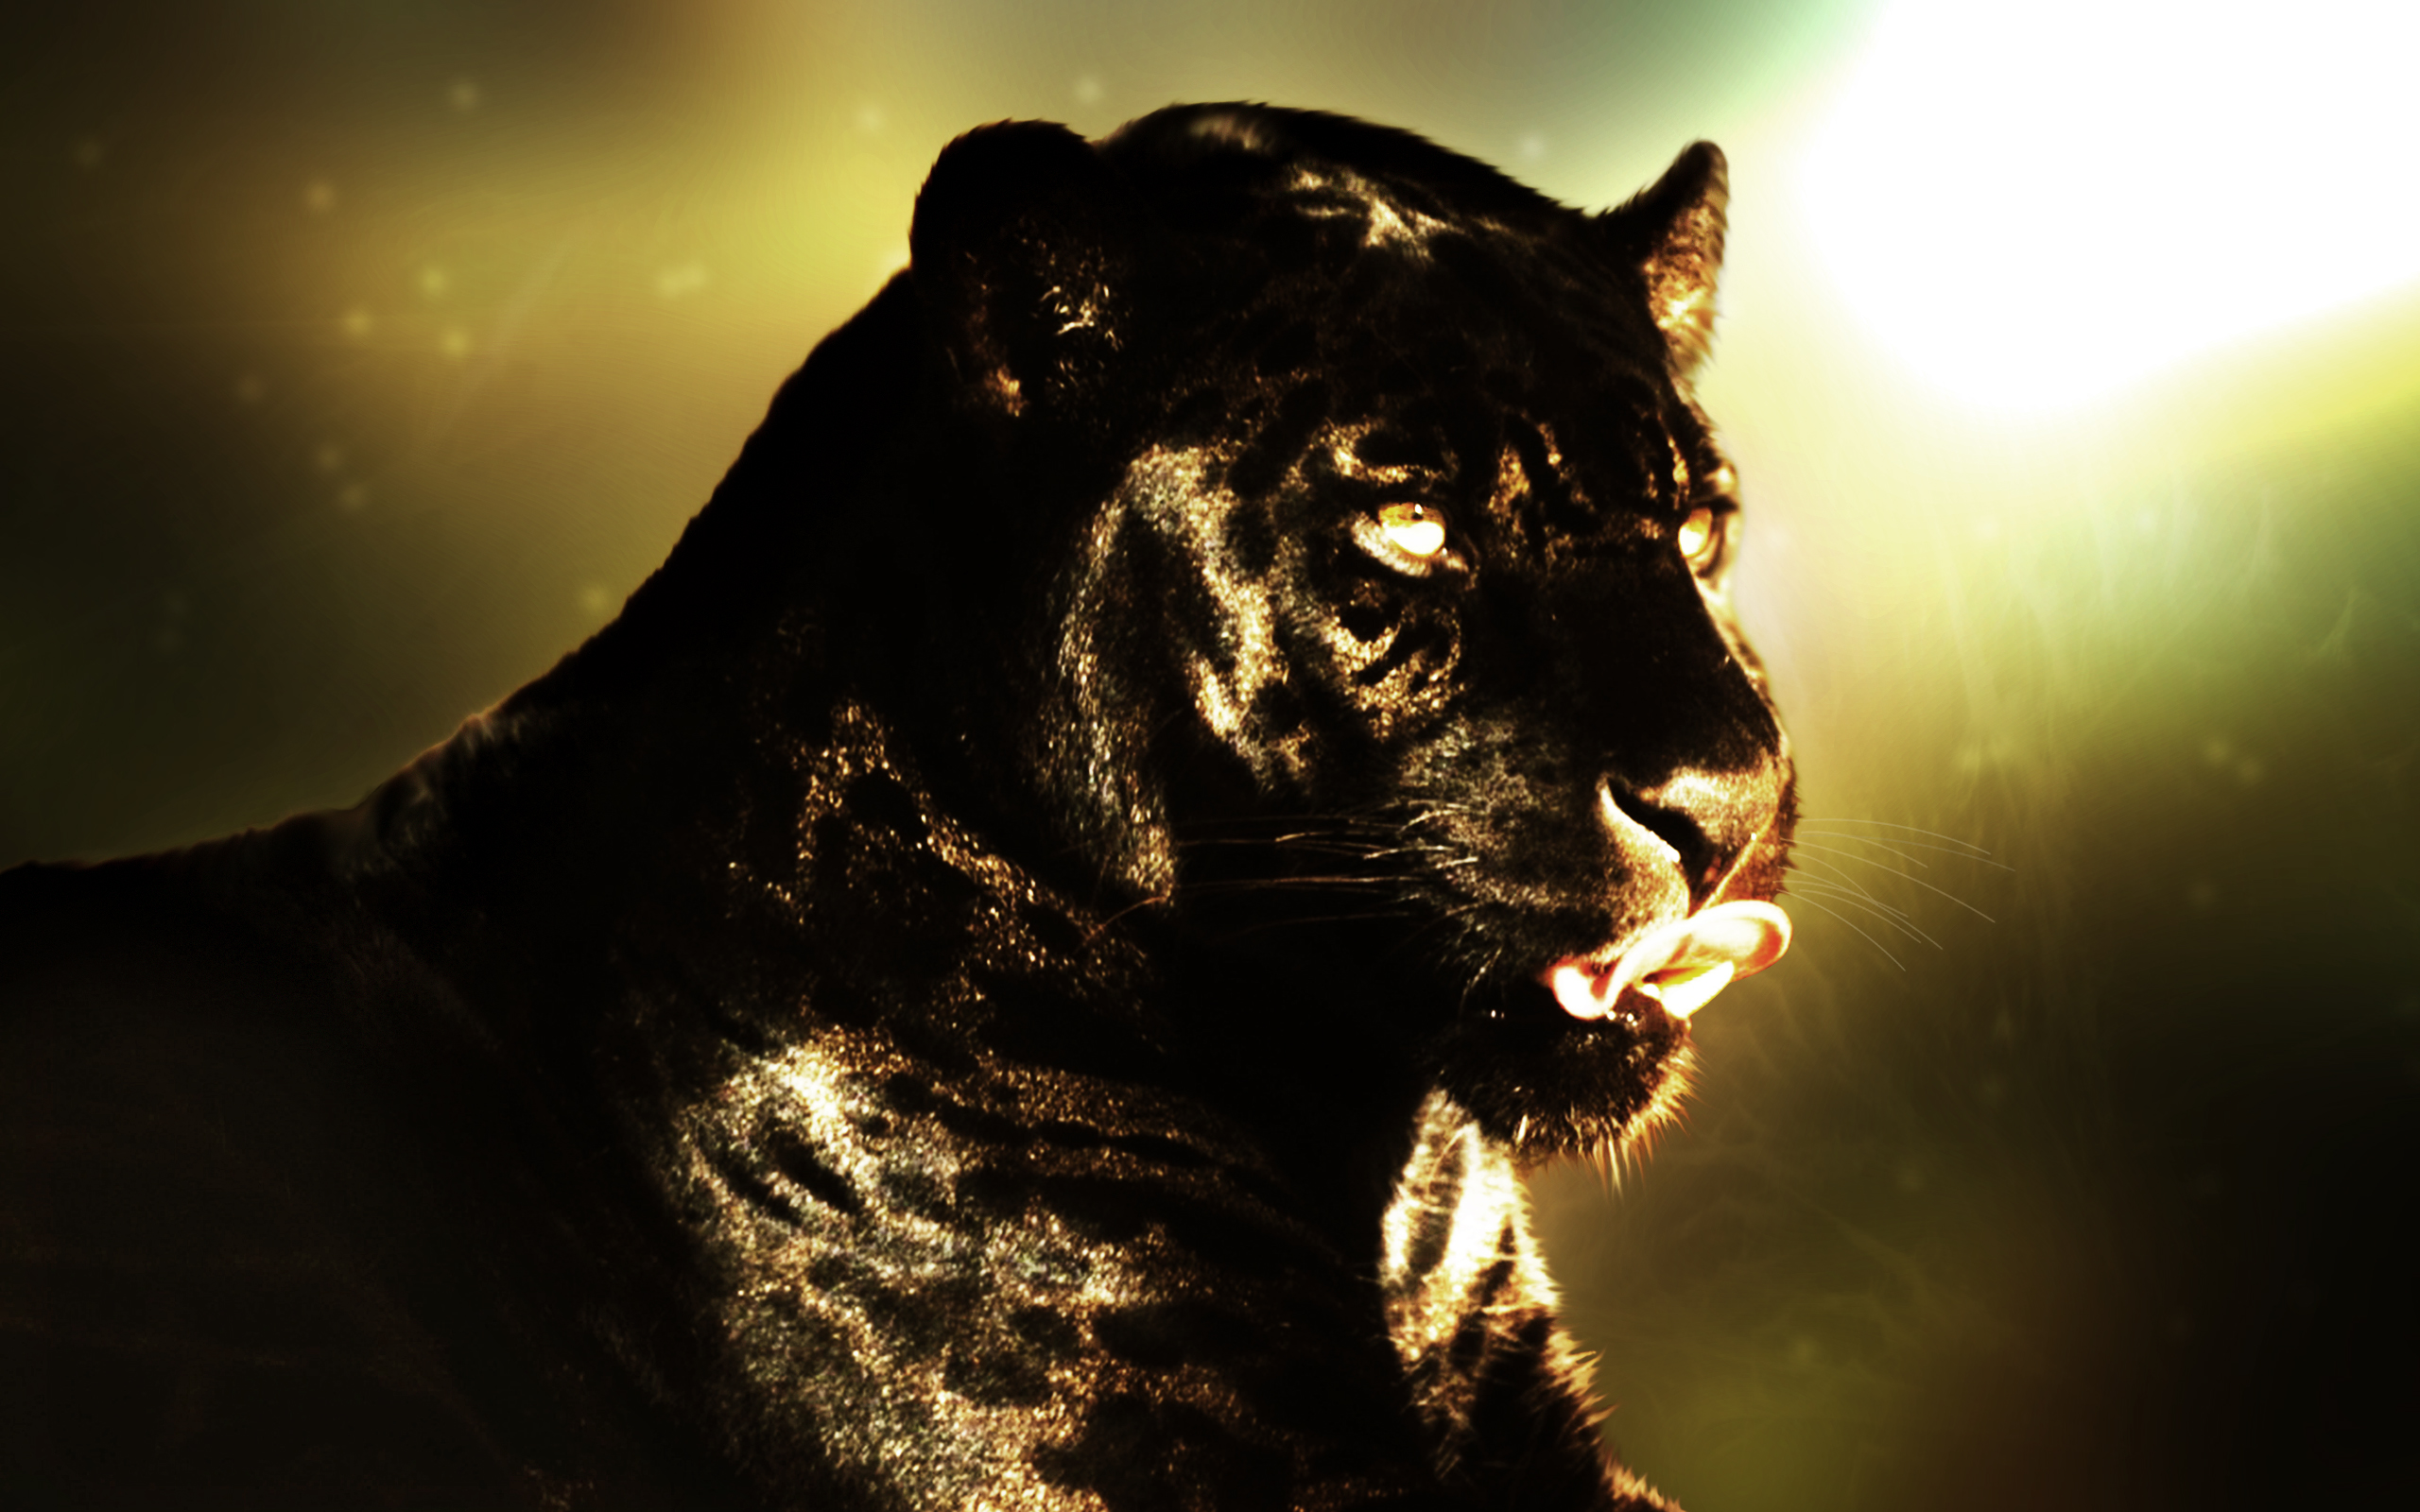 Black Panther Computer Wallpapers Desktop Backgrounds 2560x1600 2560x1600